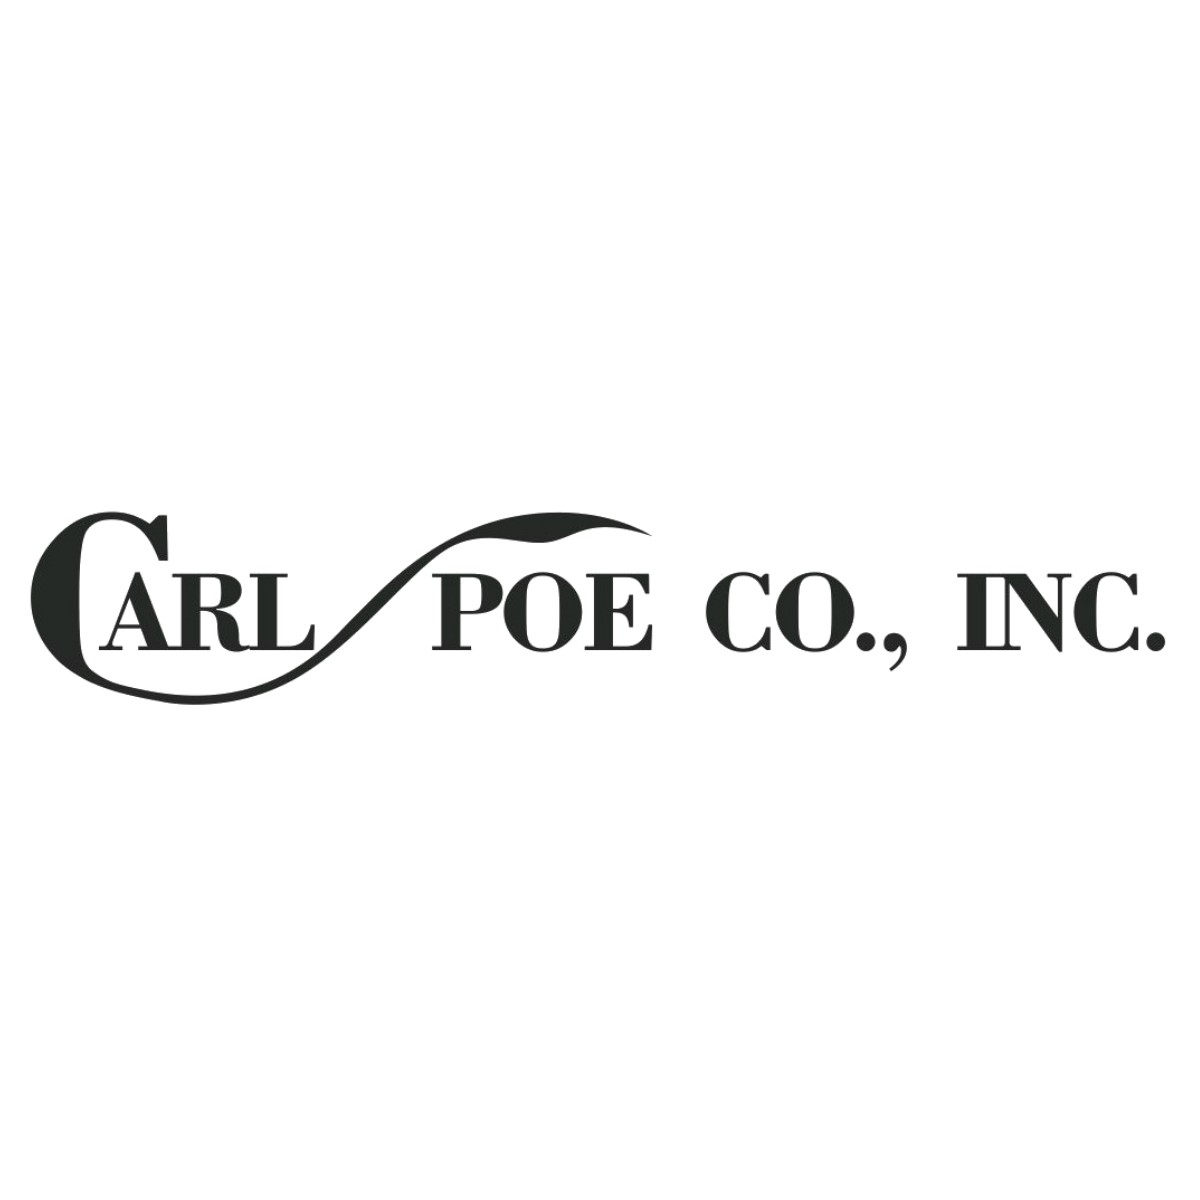 Carl Poe Company Inc.